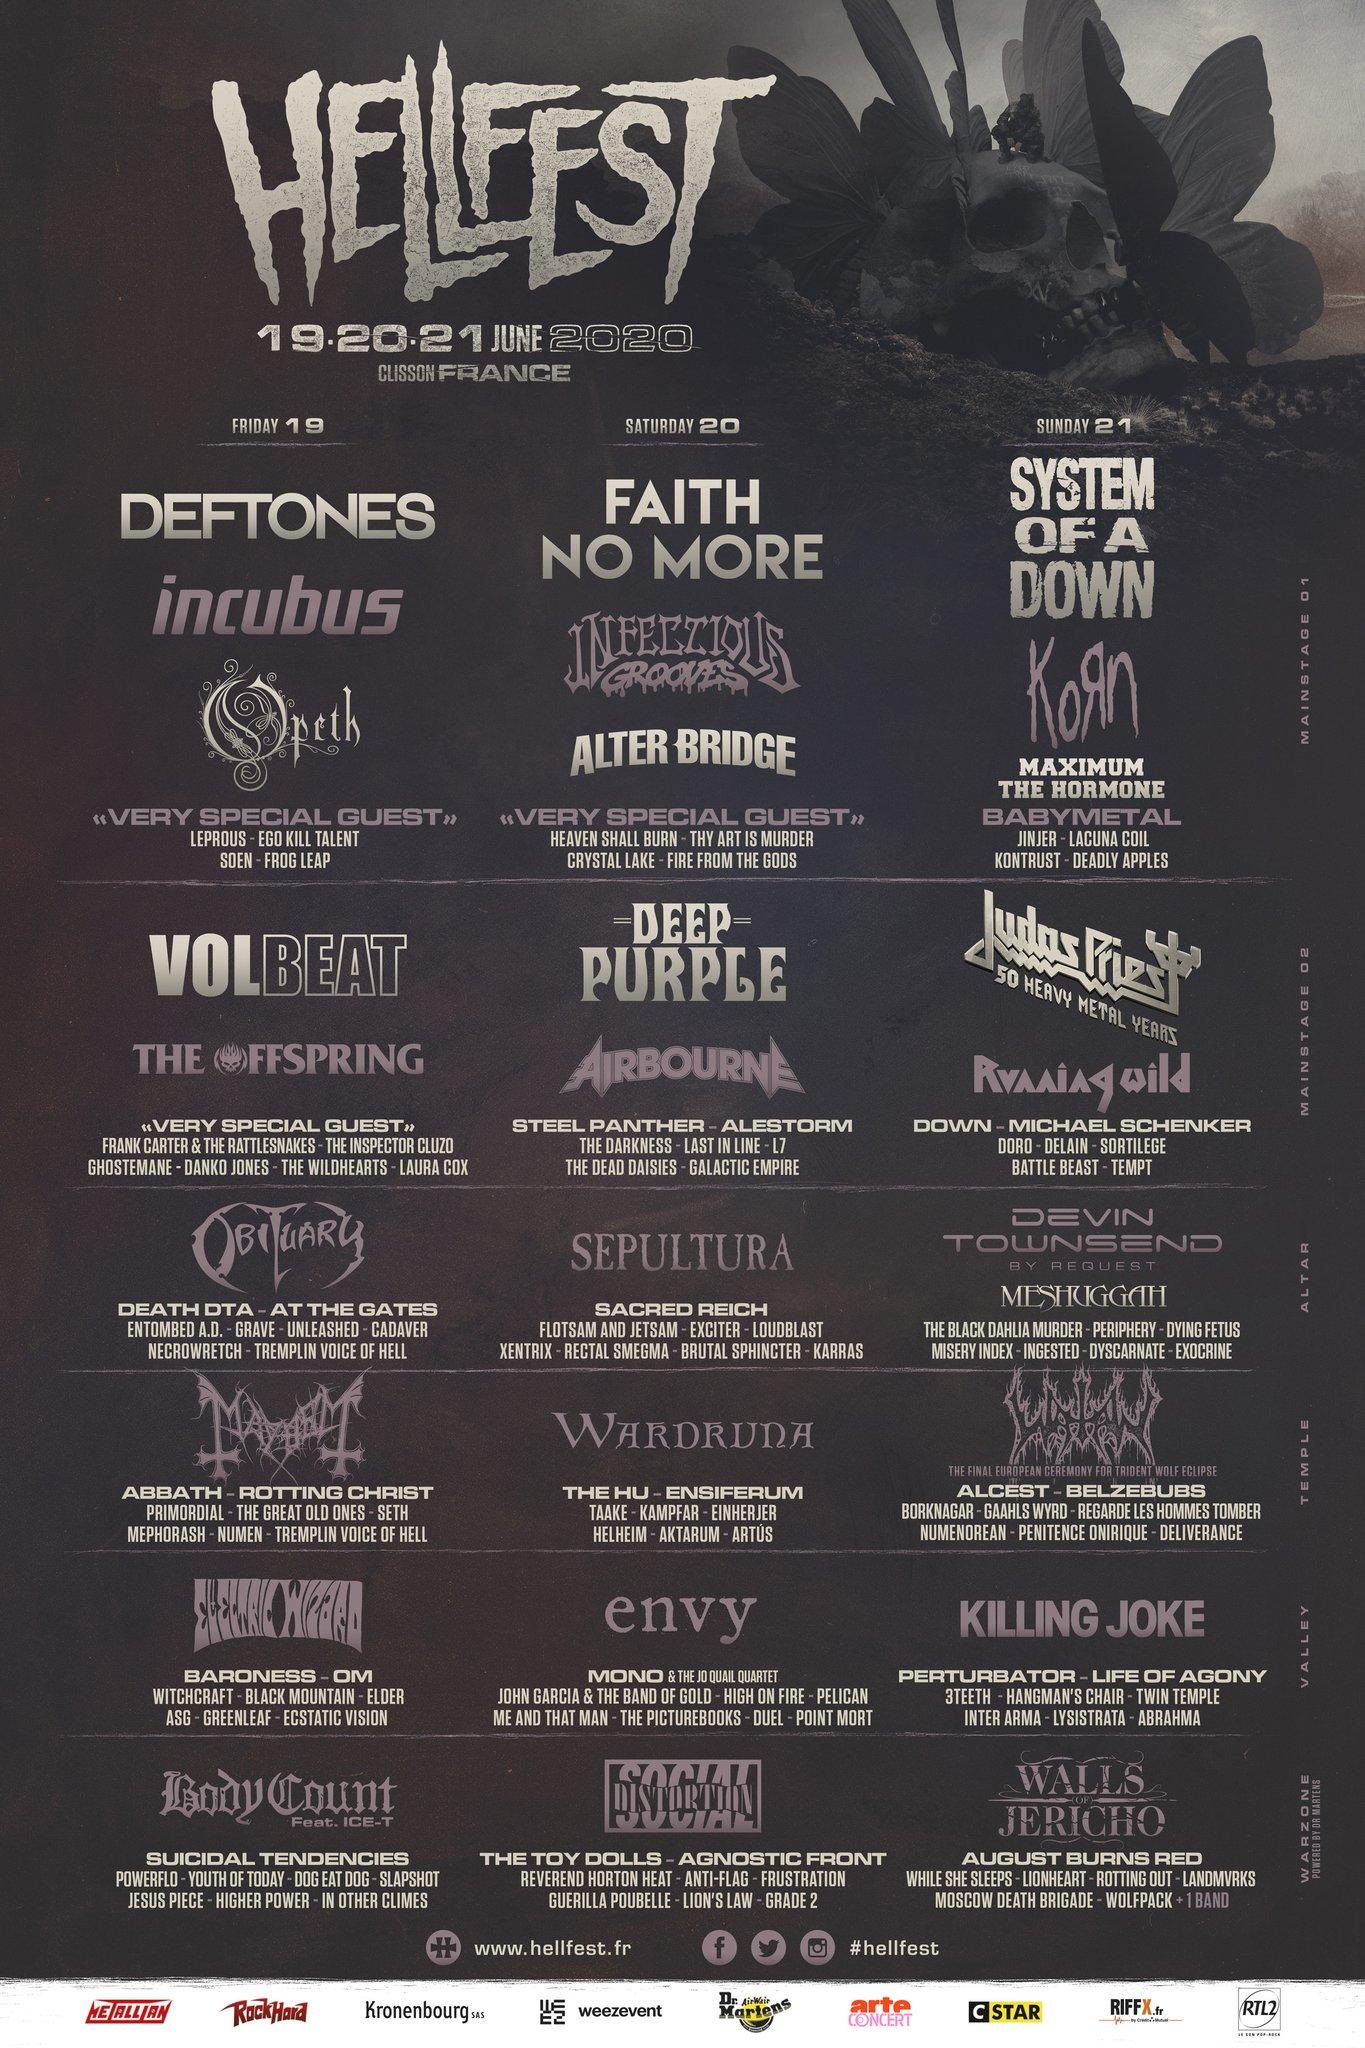 Hellfest 2020 lineup